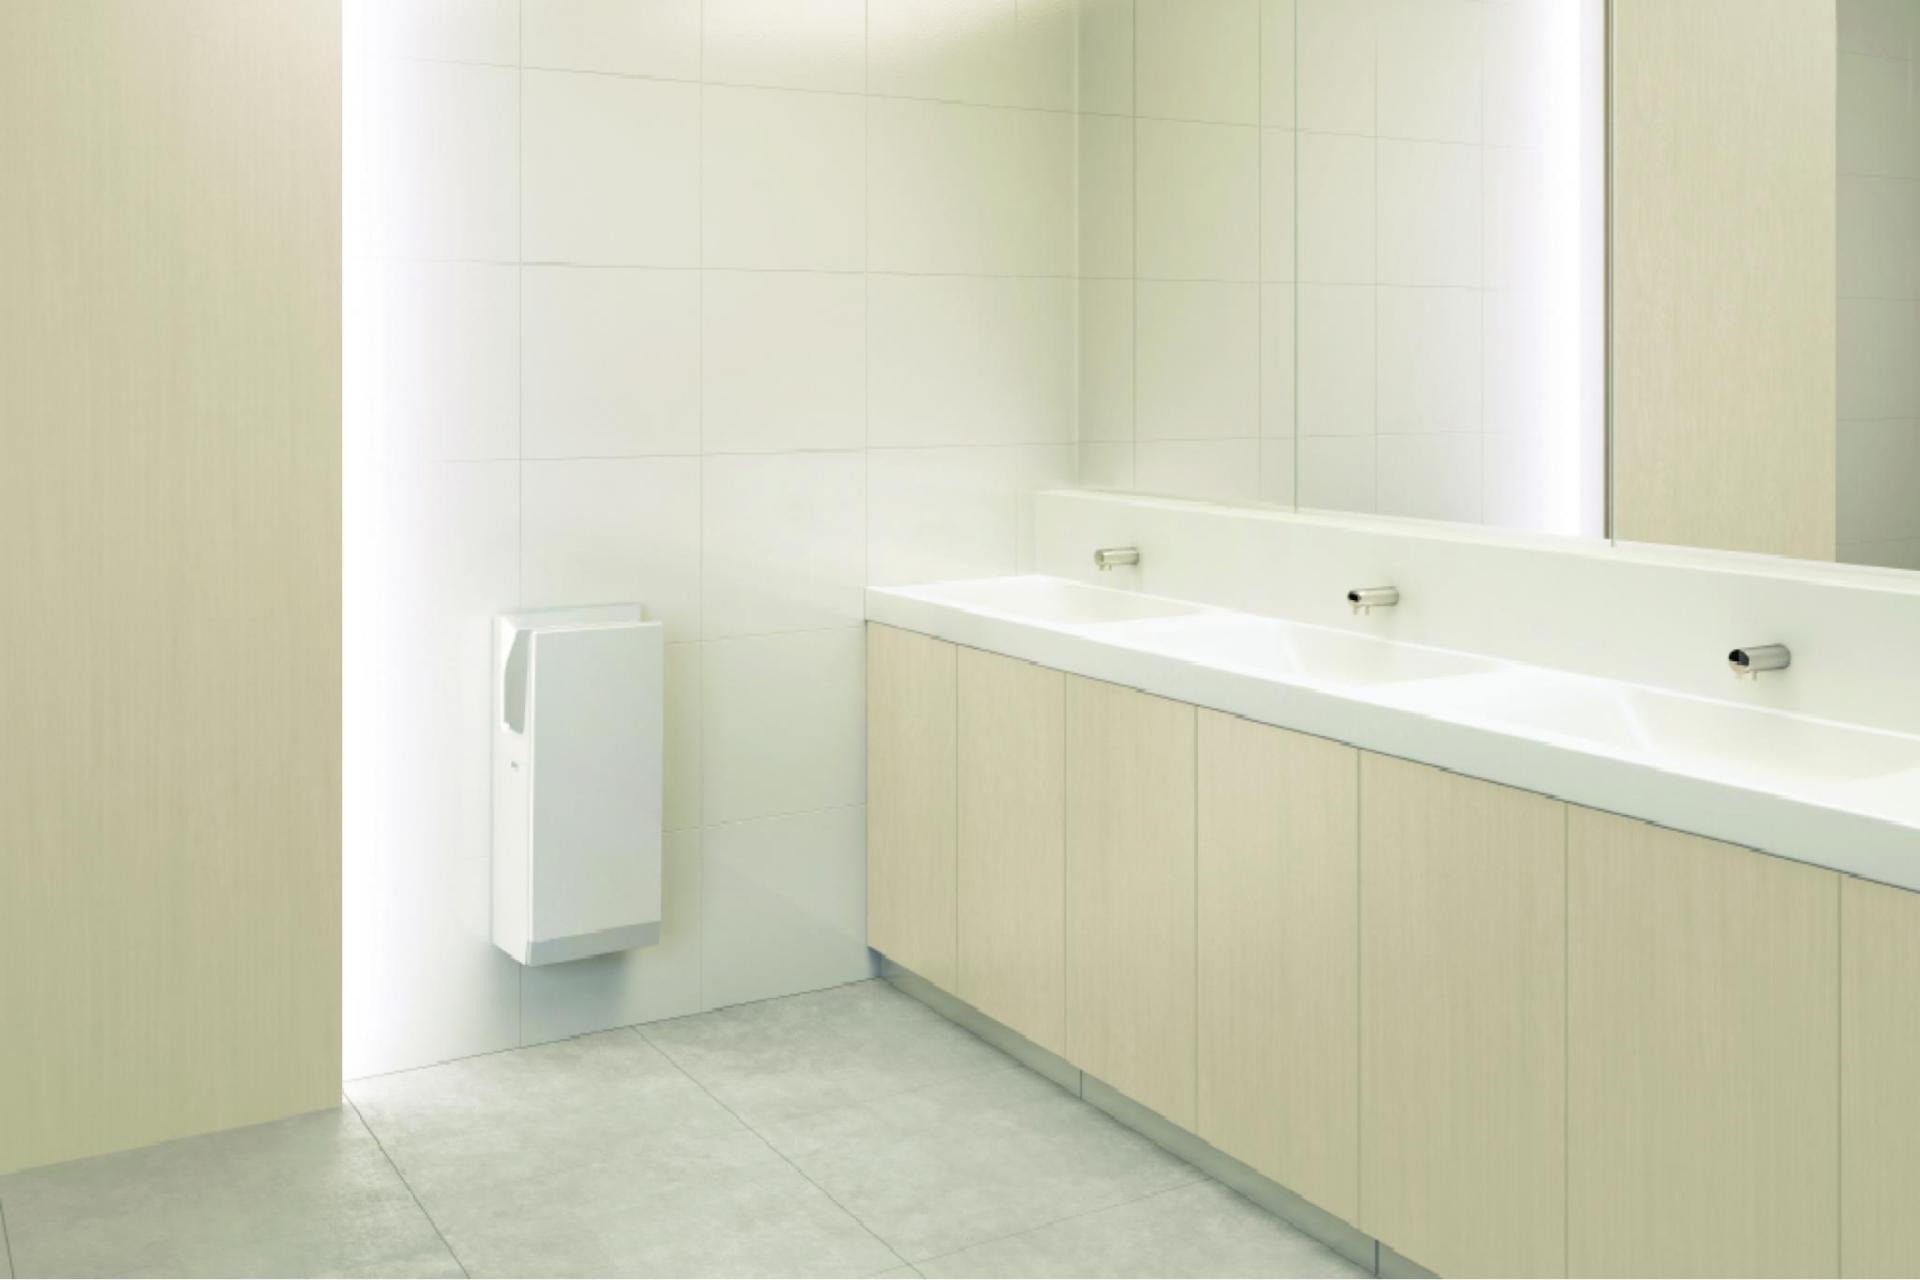 Higiena ir švara